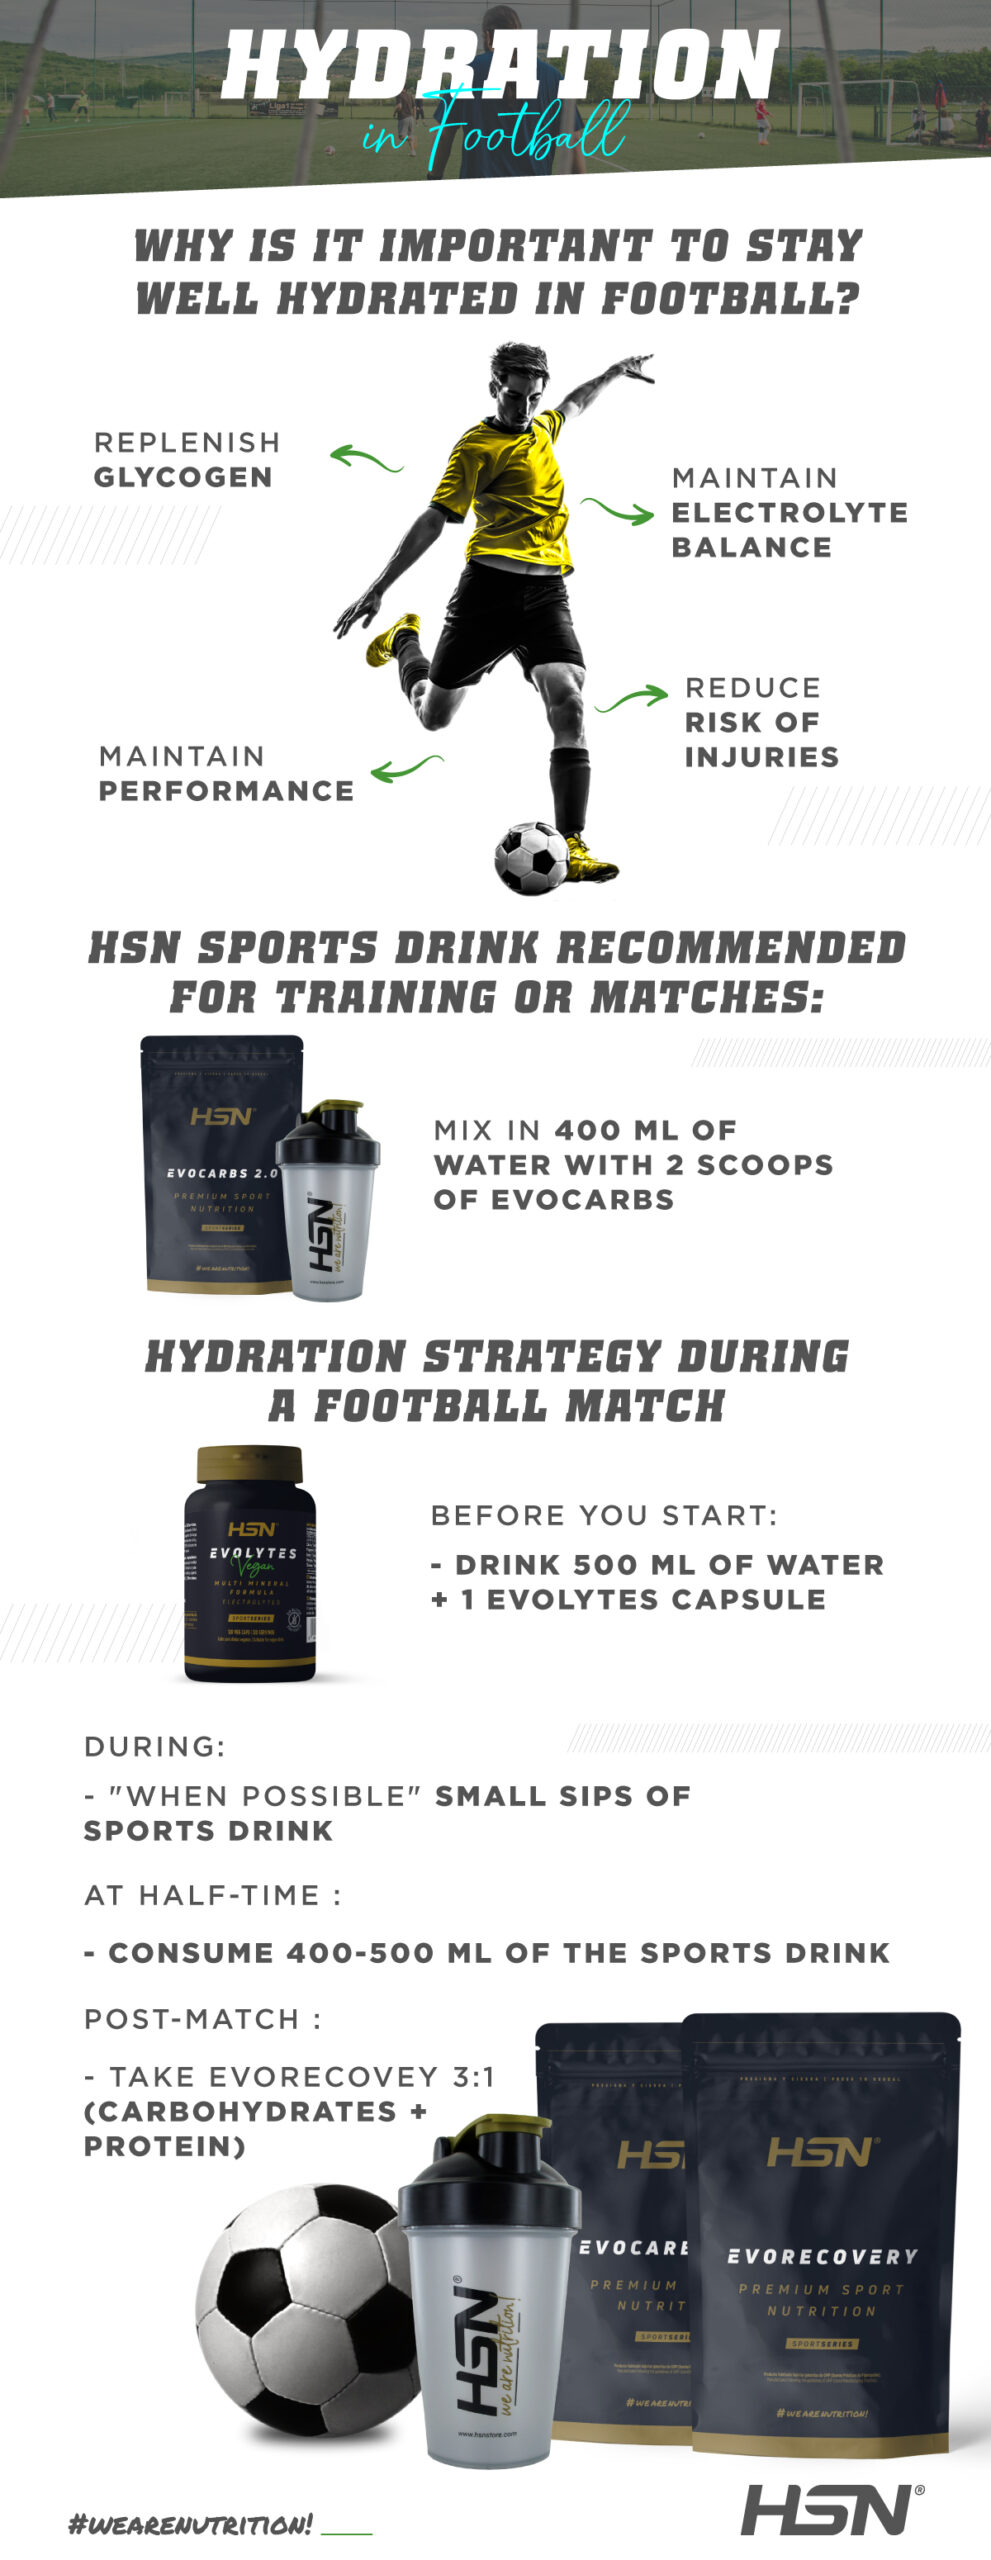 Hydration in football info